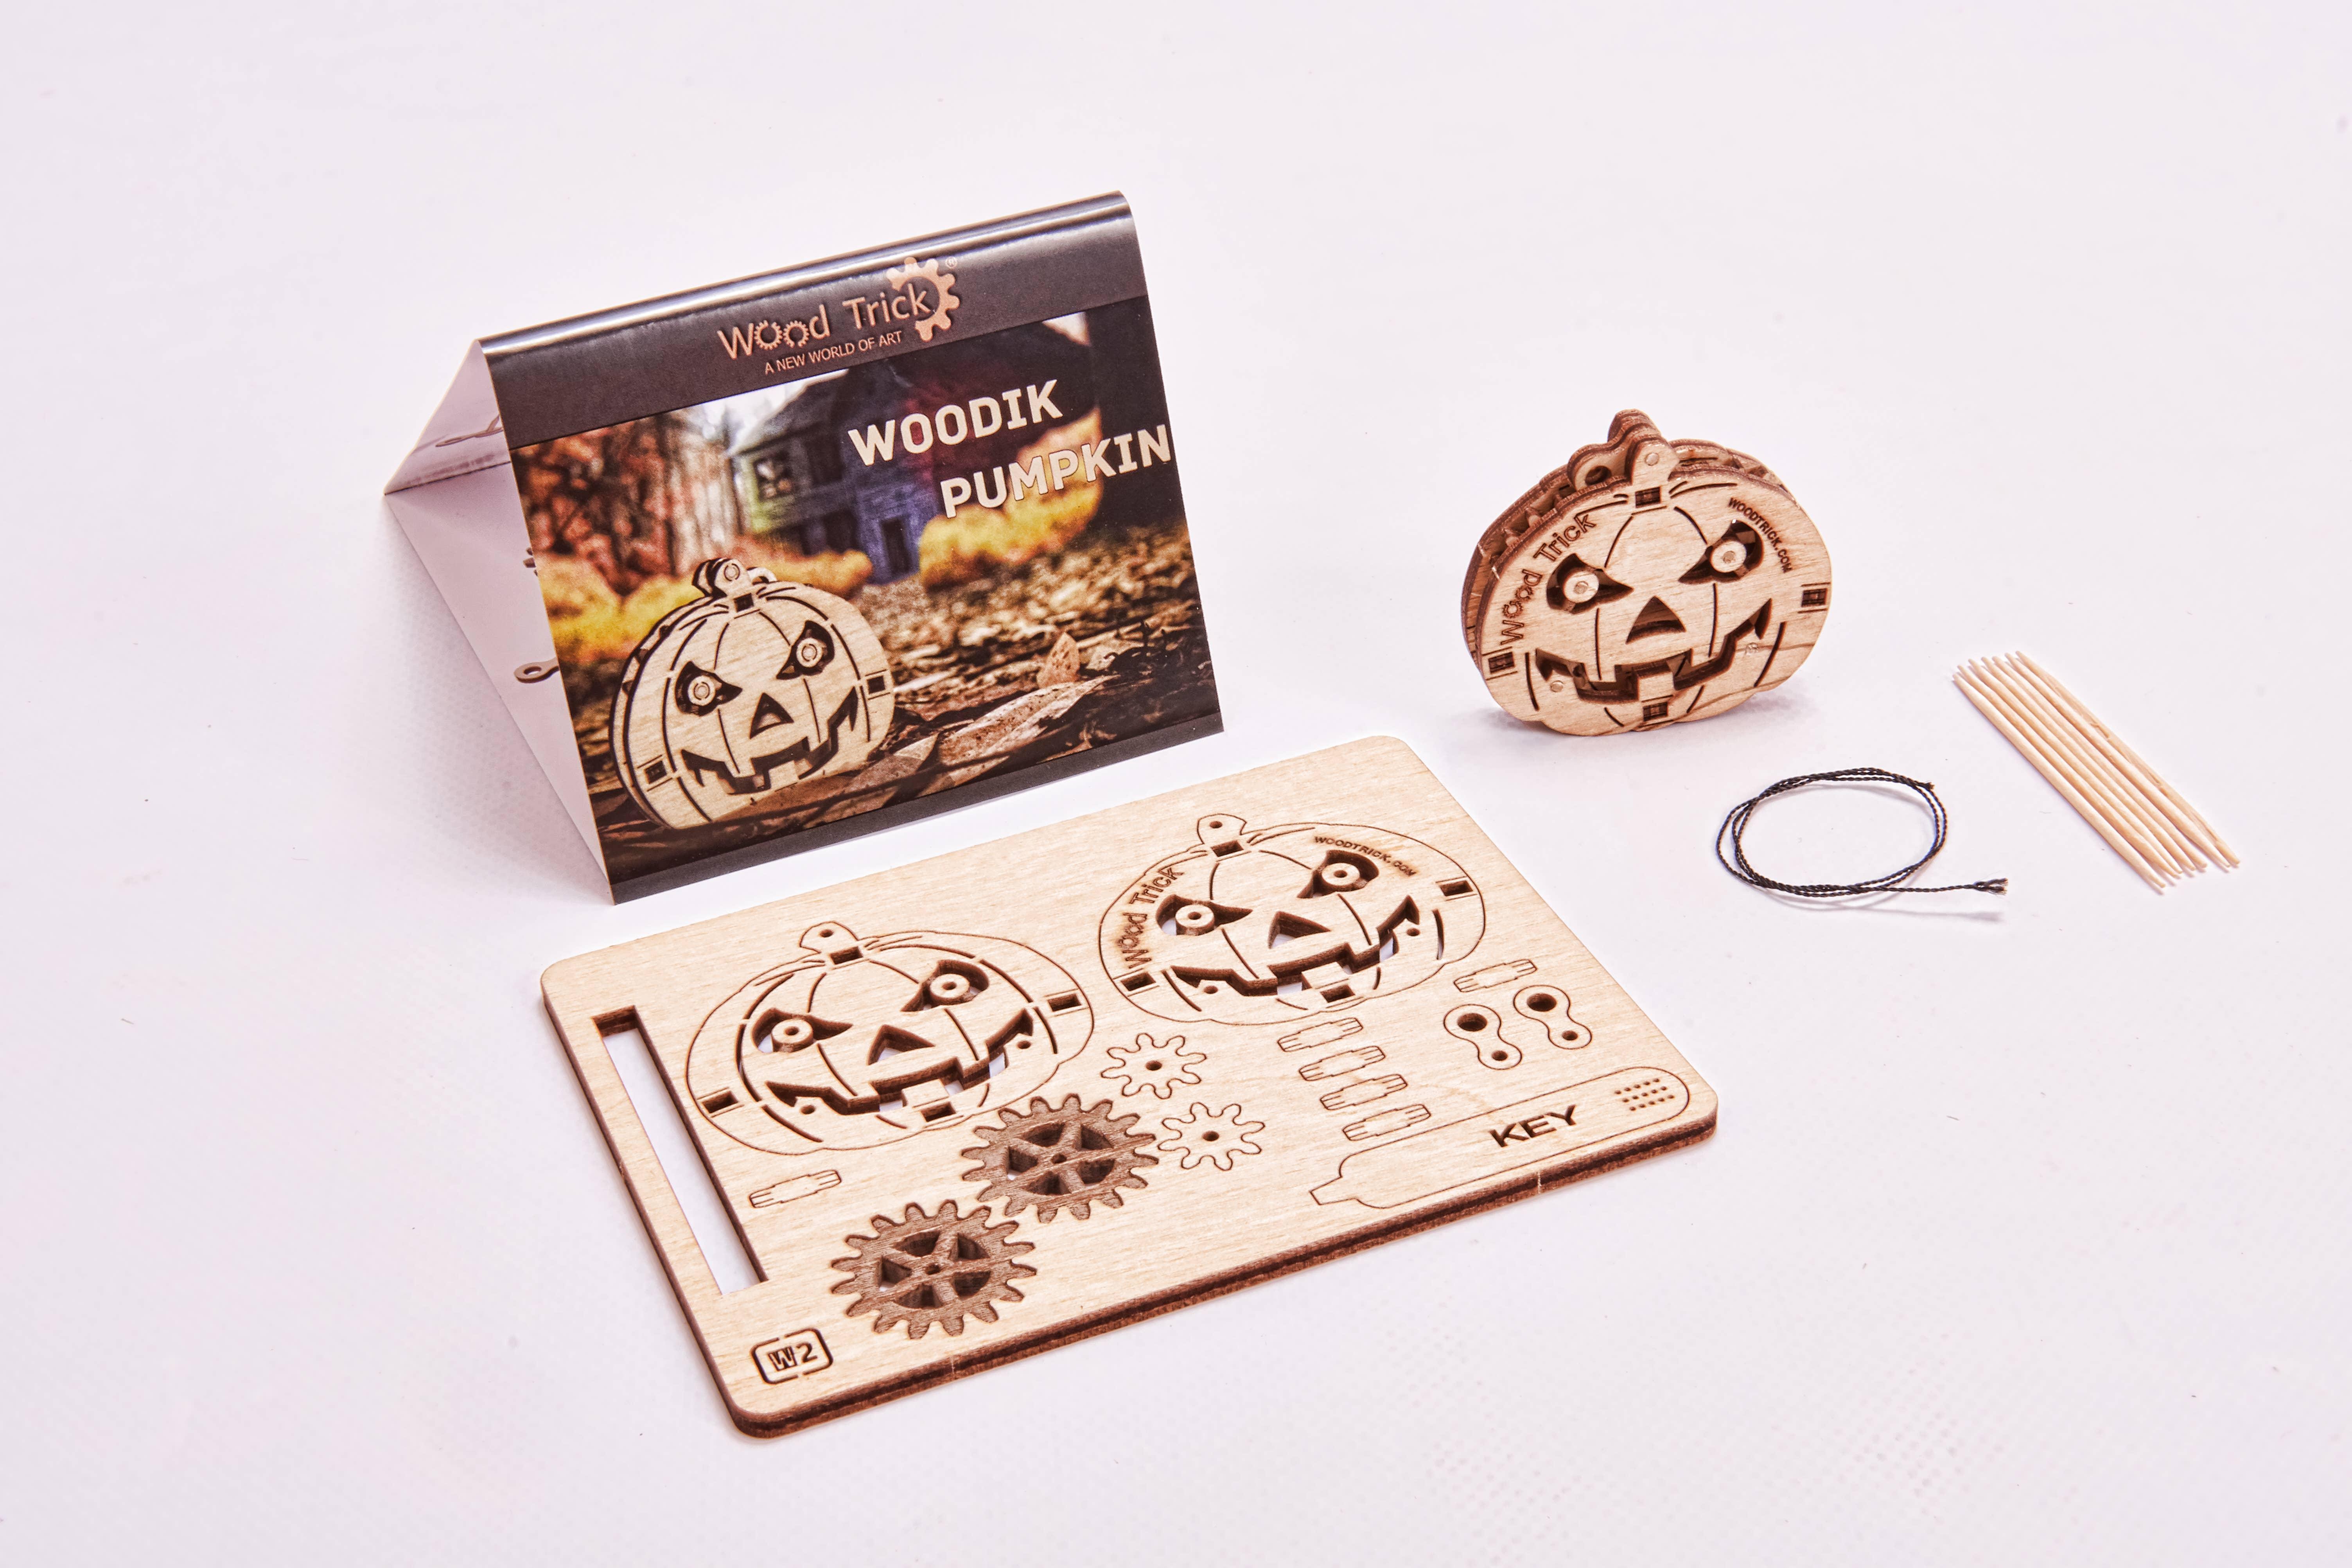 Pumpkin Woodik Puzzle | Trada Marketplace